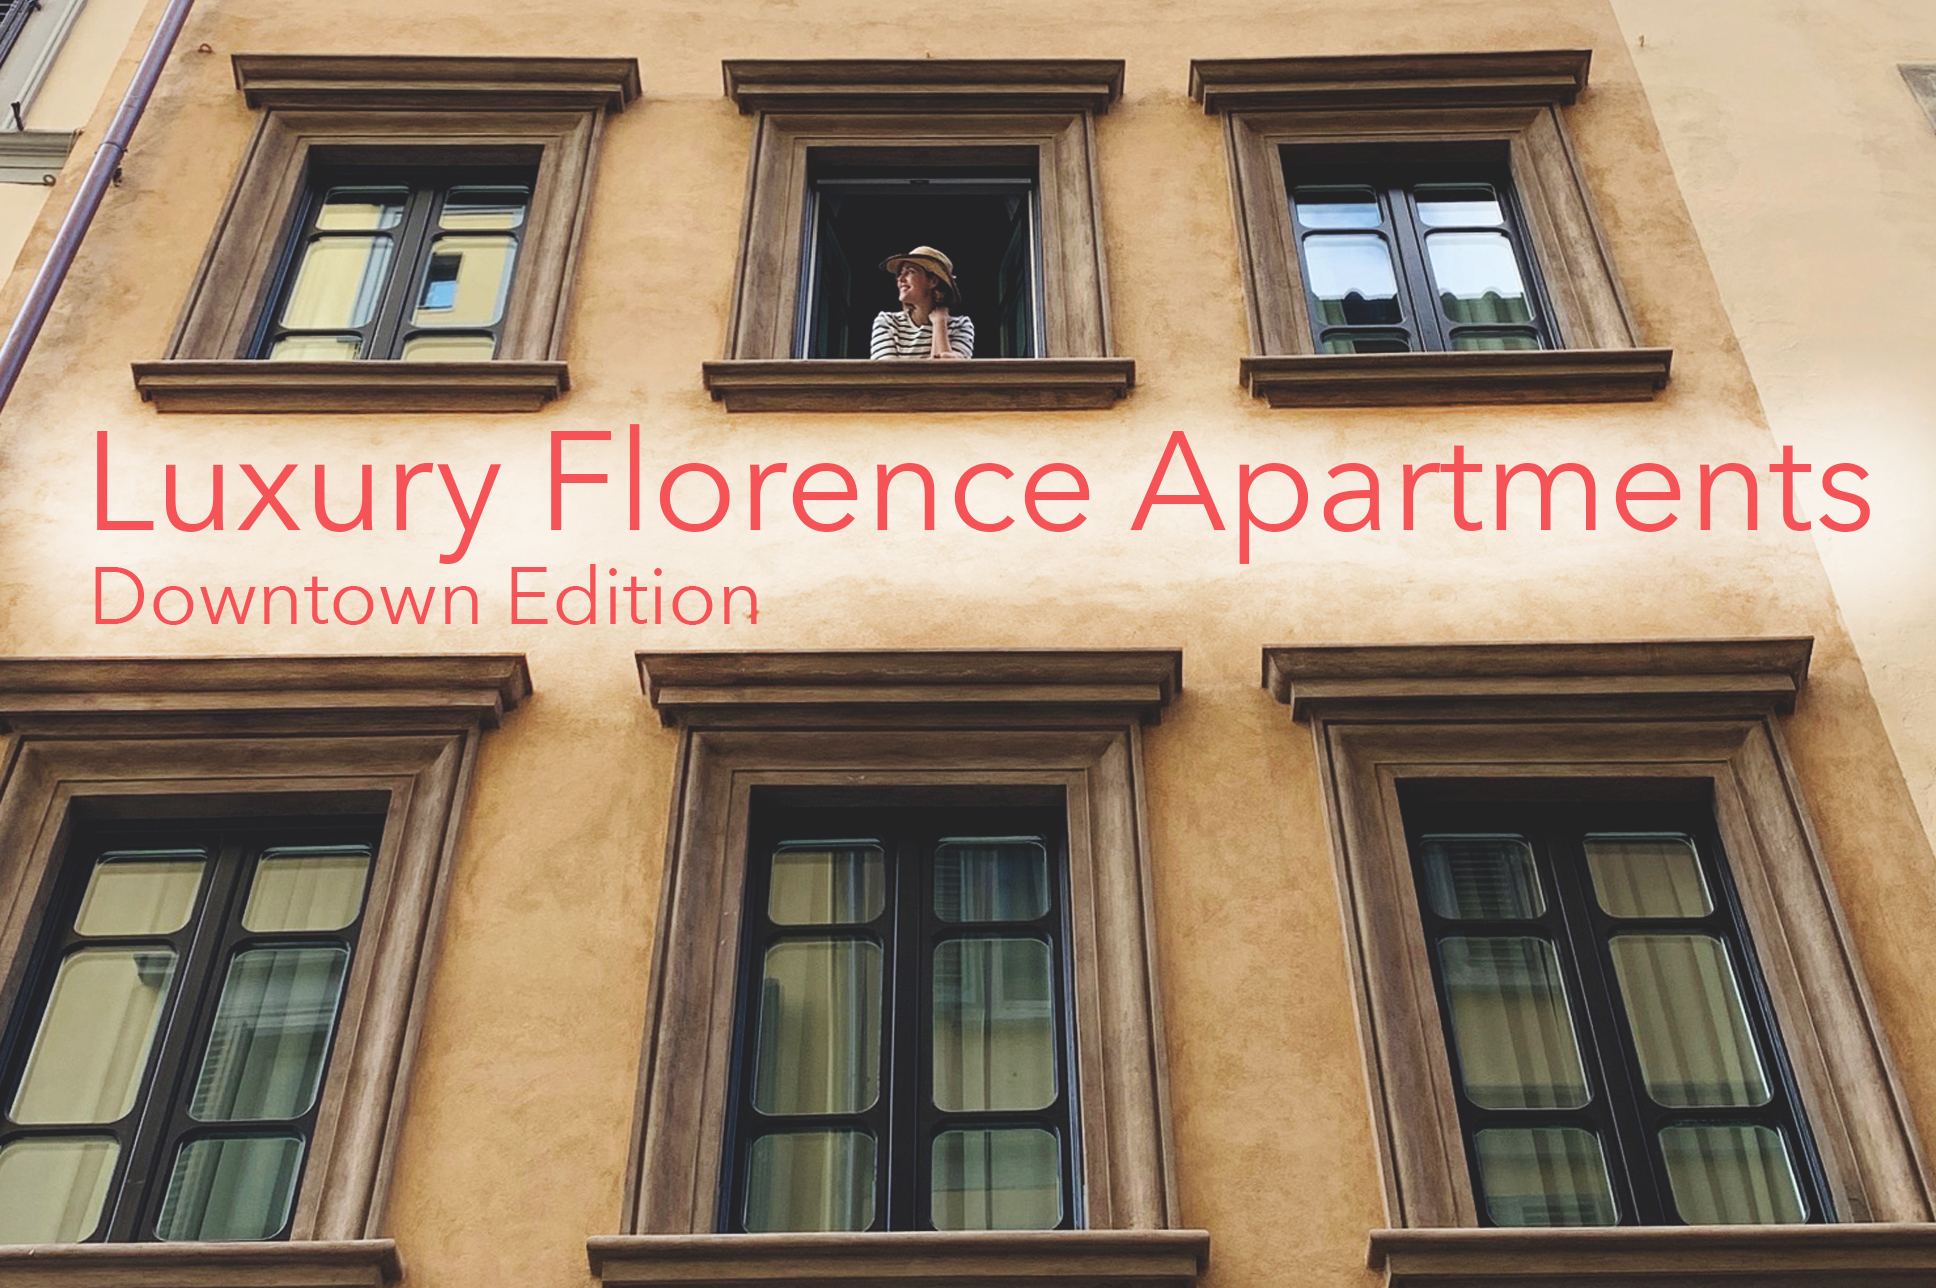 Downtown Luxury Apartments in Florence, Italy - Tiana Kai